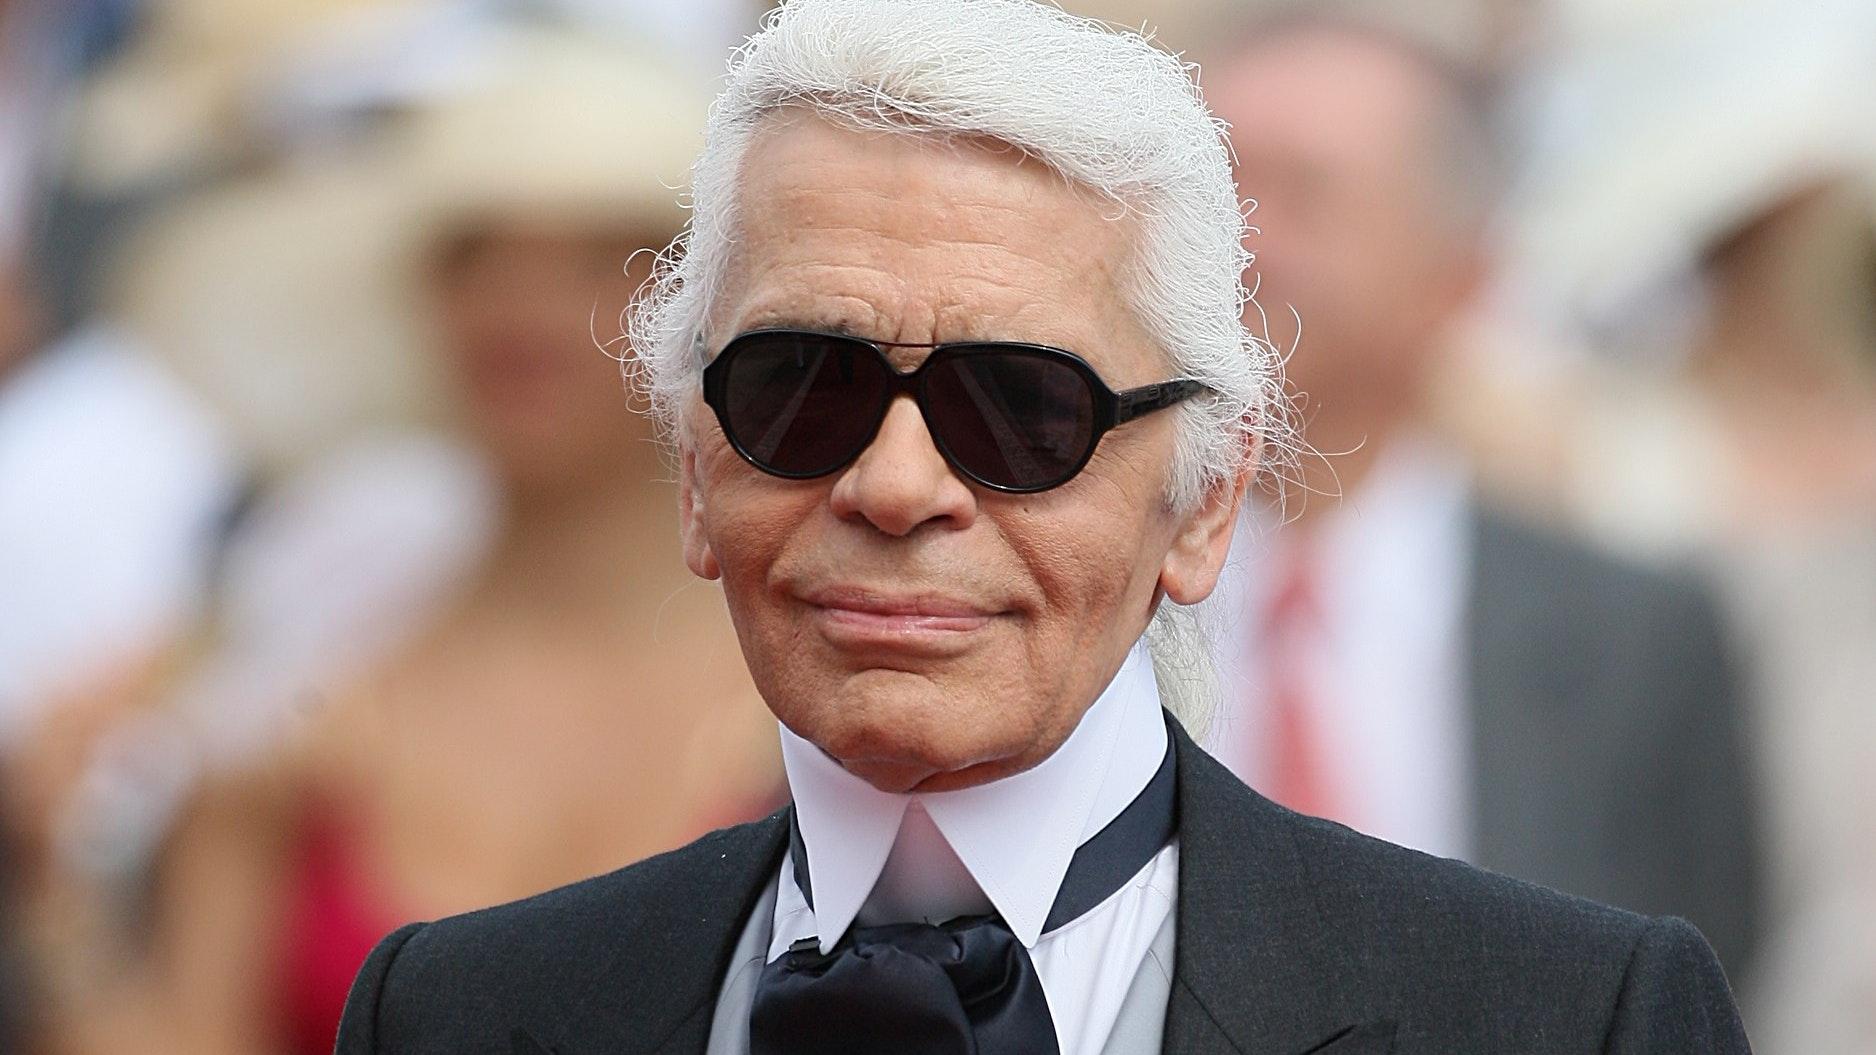 Legendary Fashion Designer Karl Lagerfeld Dies In Paris At 85 Years Old